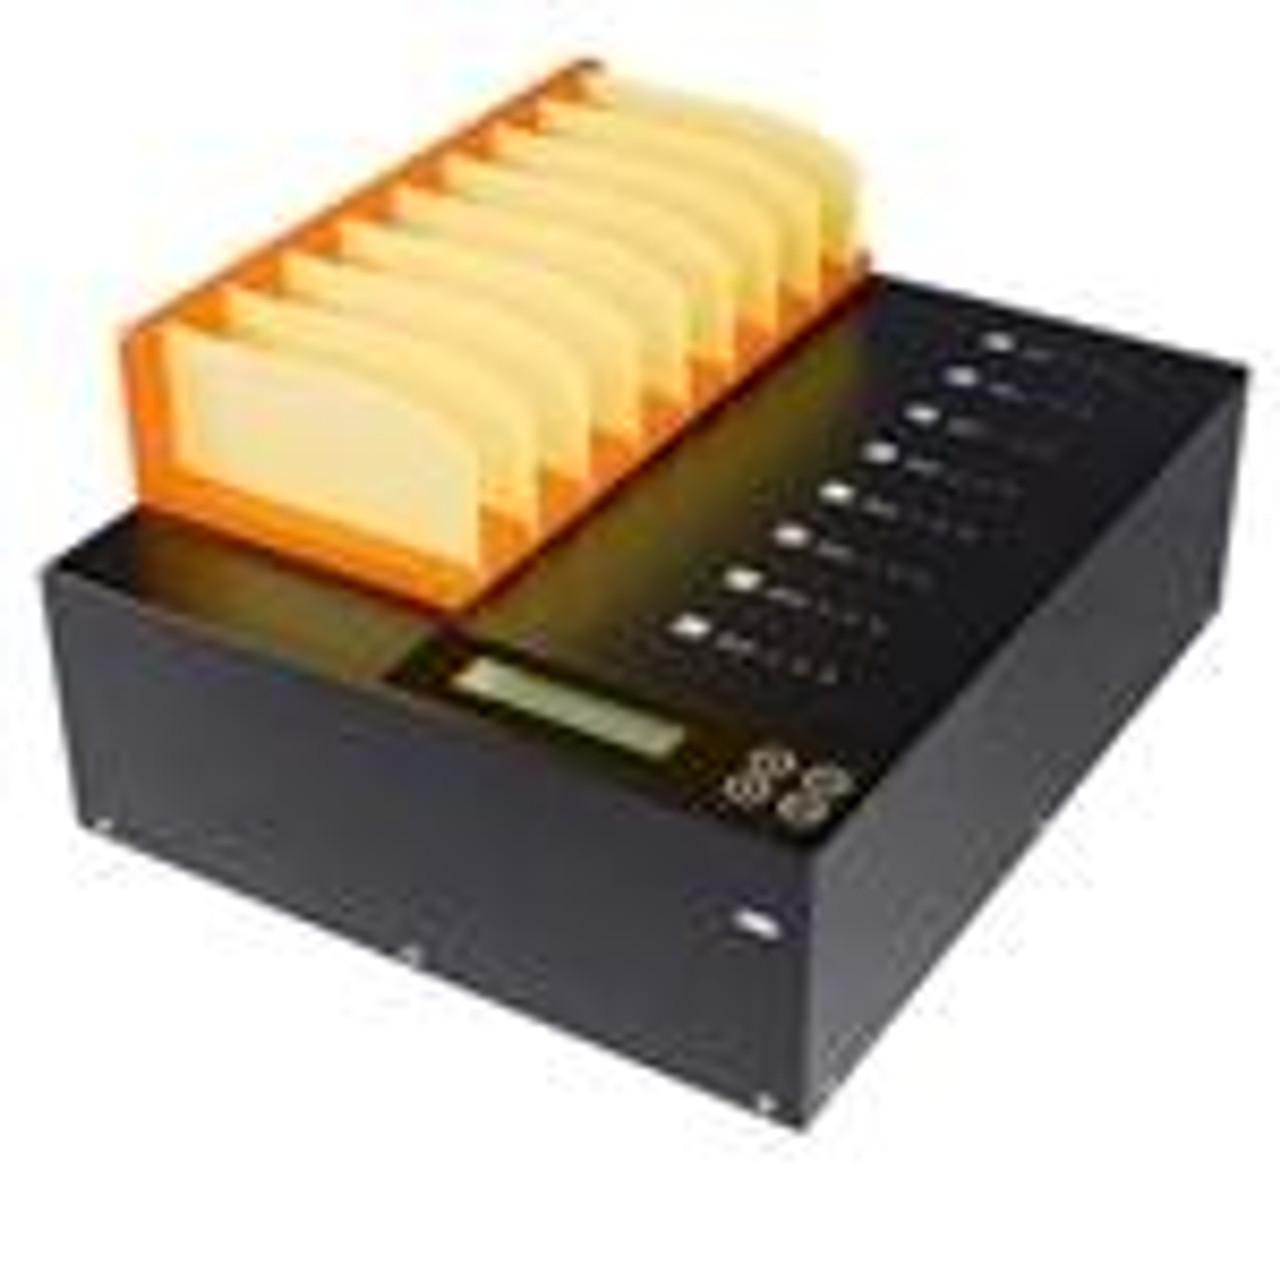 1-to-7 GX Pro Series HDD/SSD Drive Duplicator